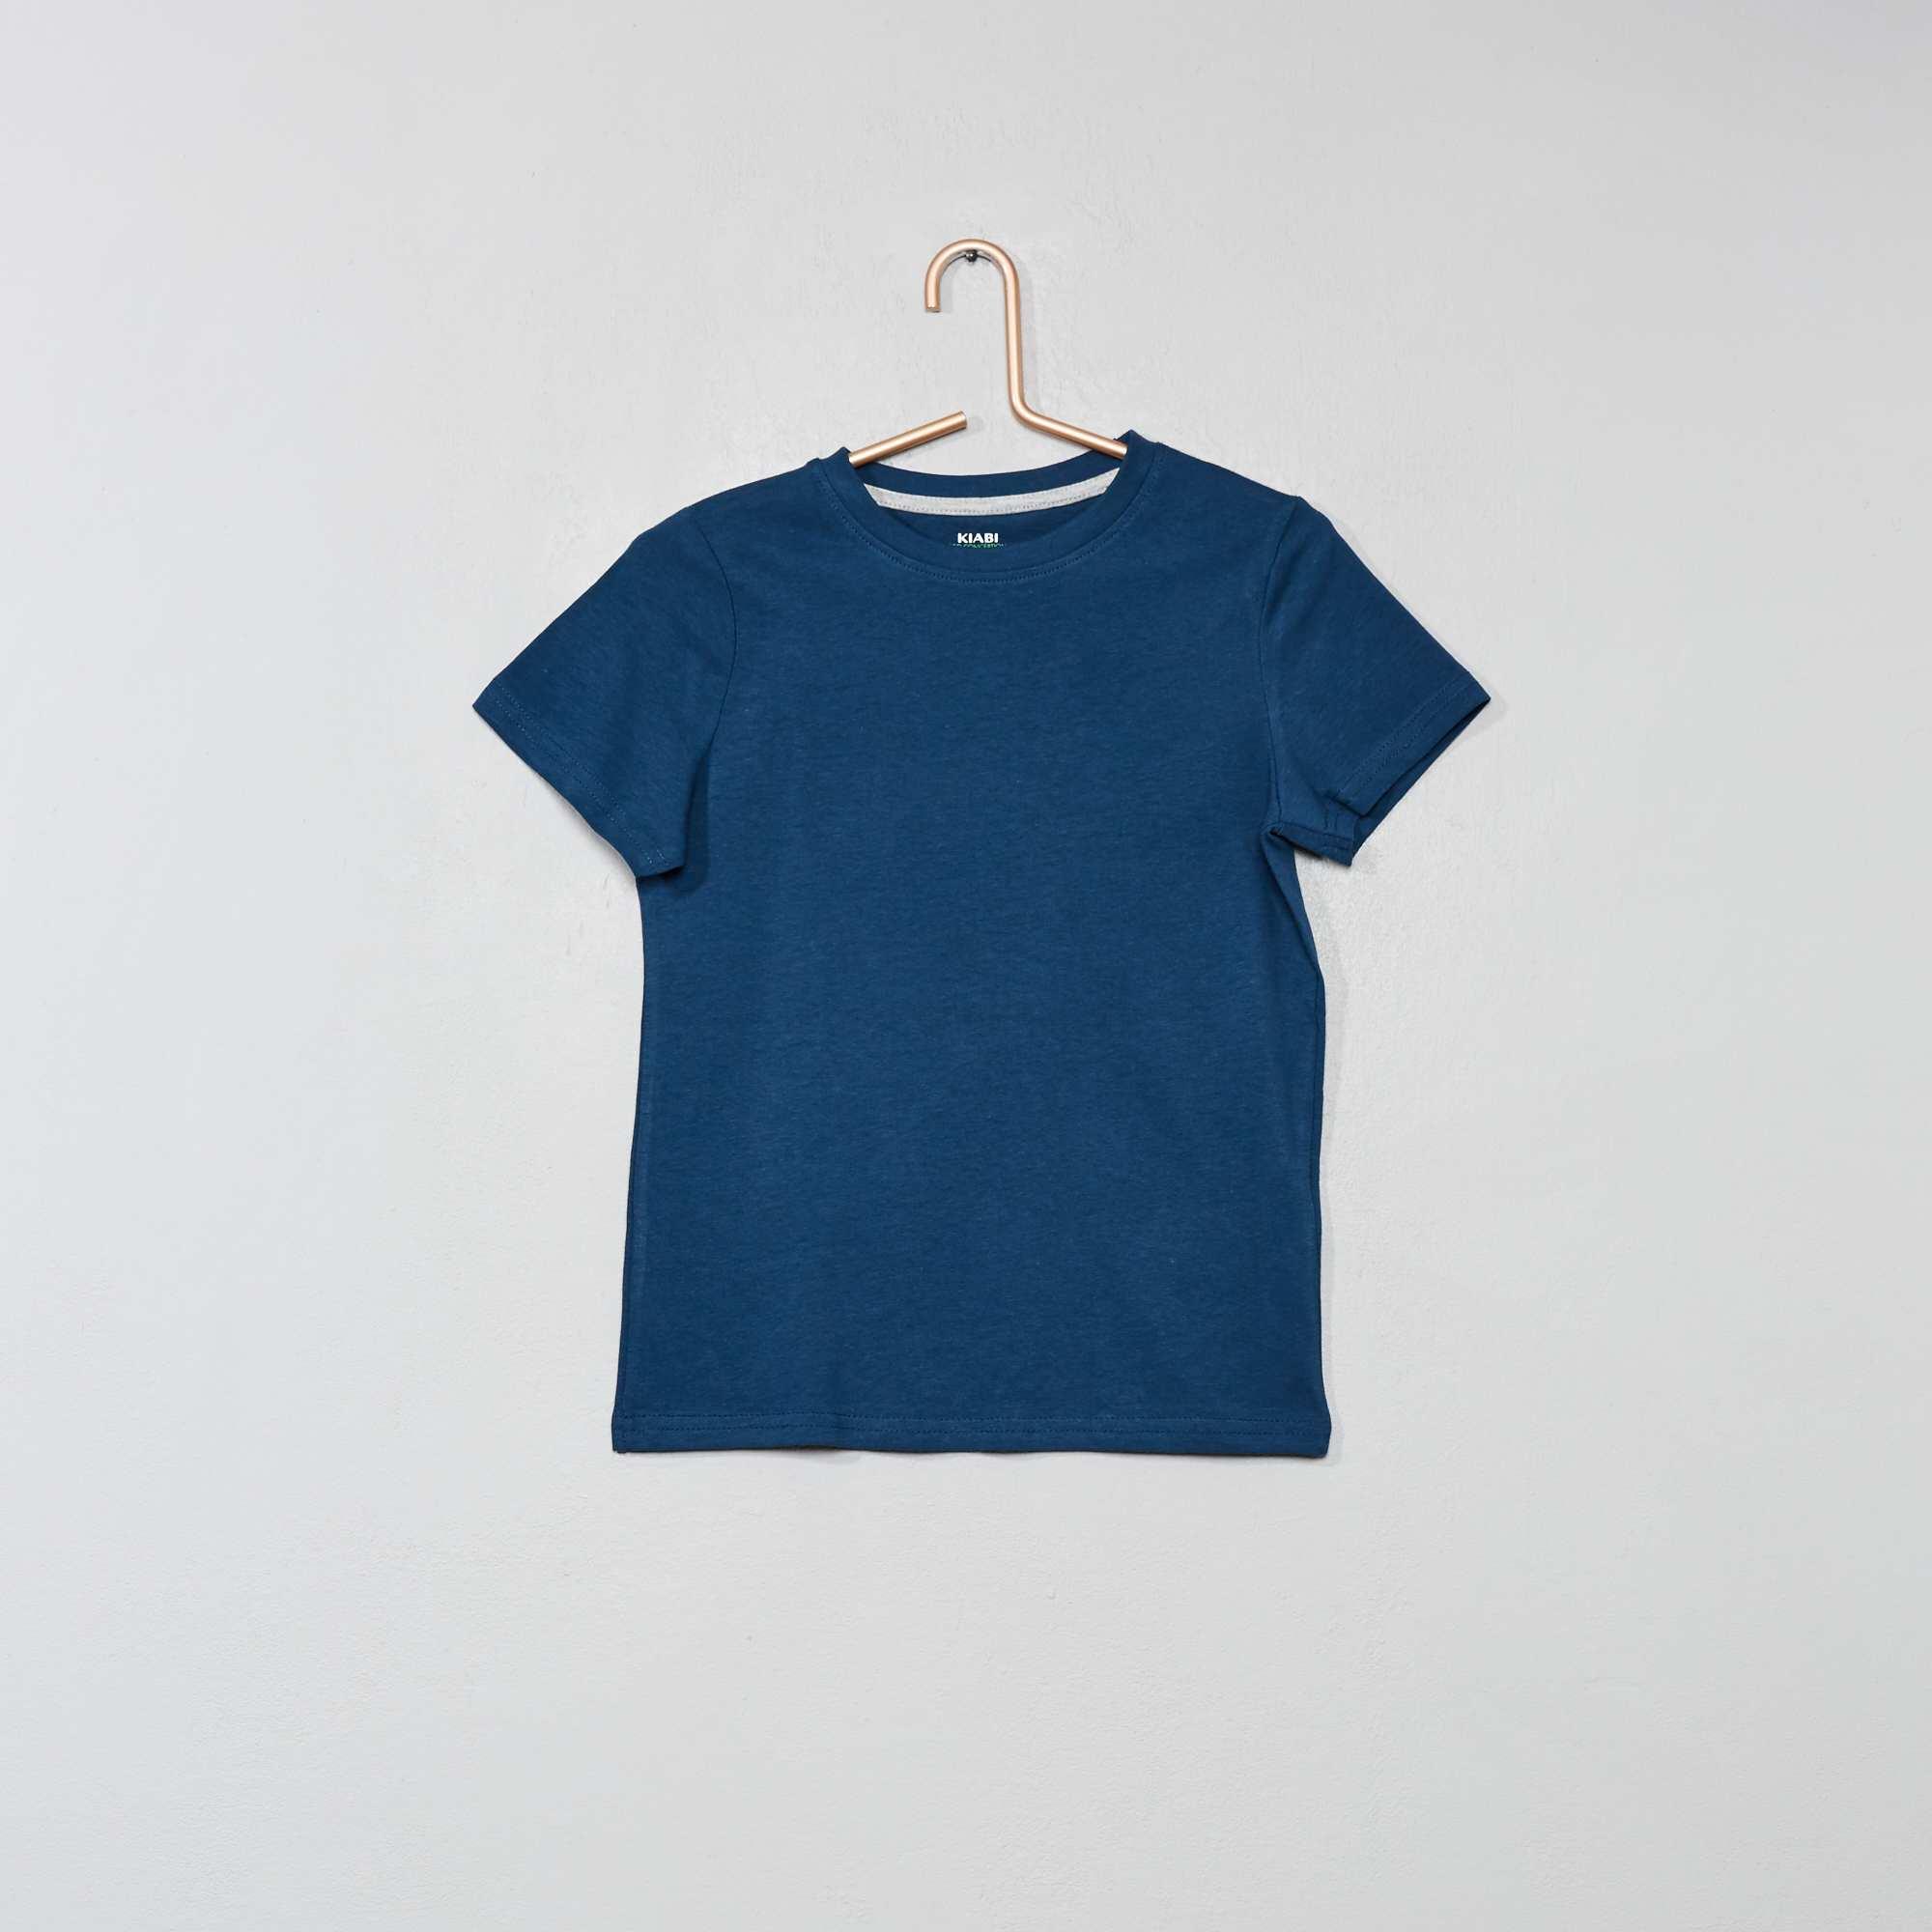 ab5422b71c7d Maglietta puro cotone bio Infanzia bambino - BLU - Kiabi - 1,00€